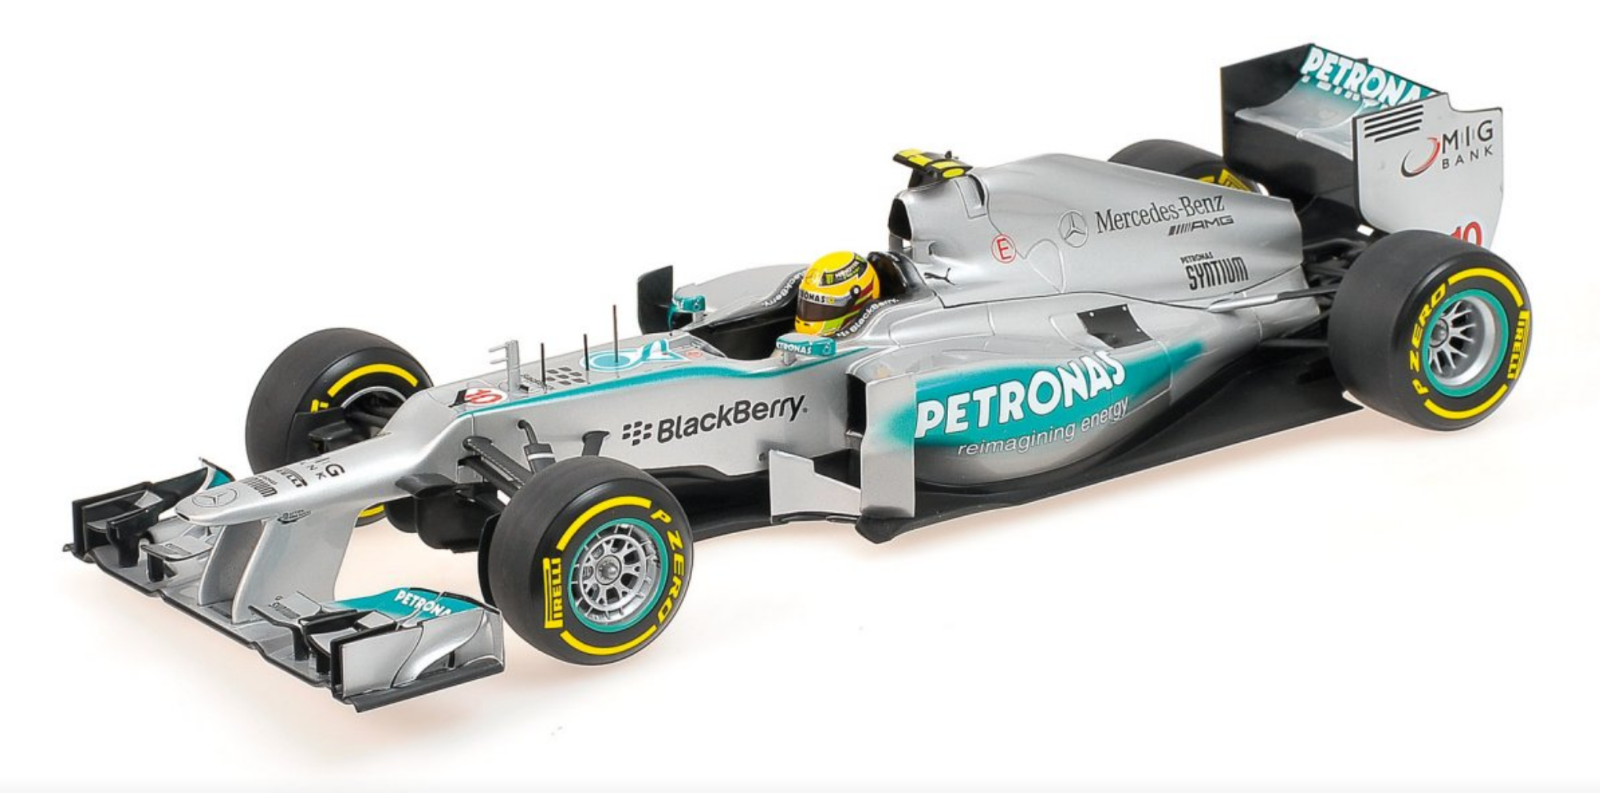 1 18 Mercedes Hamilton F1 2013 1 18 • Minichamps 110130080